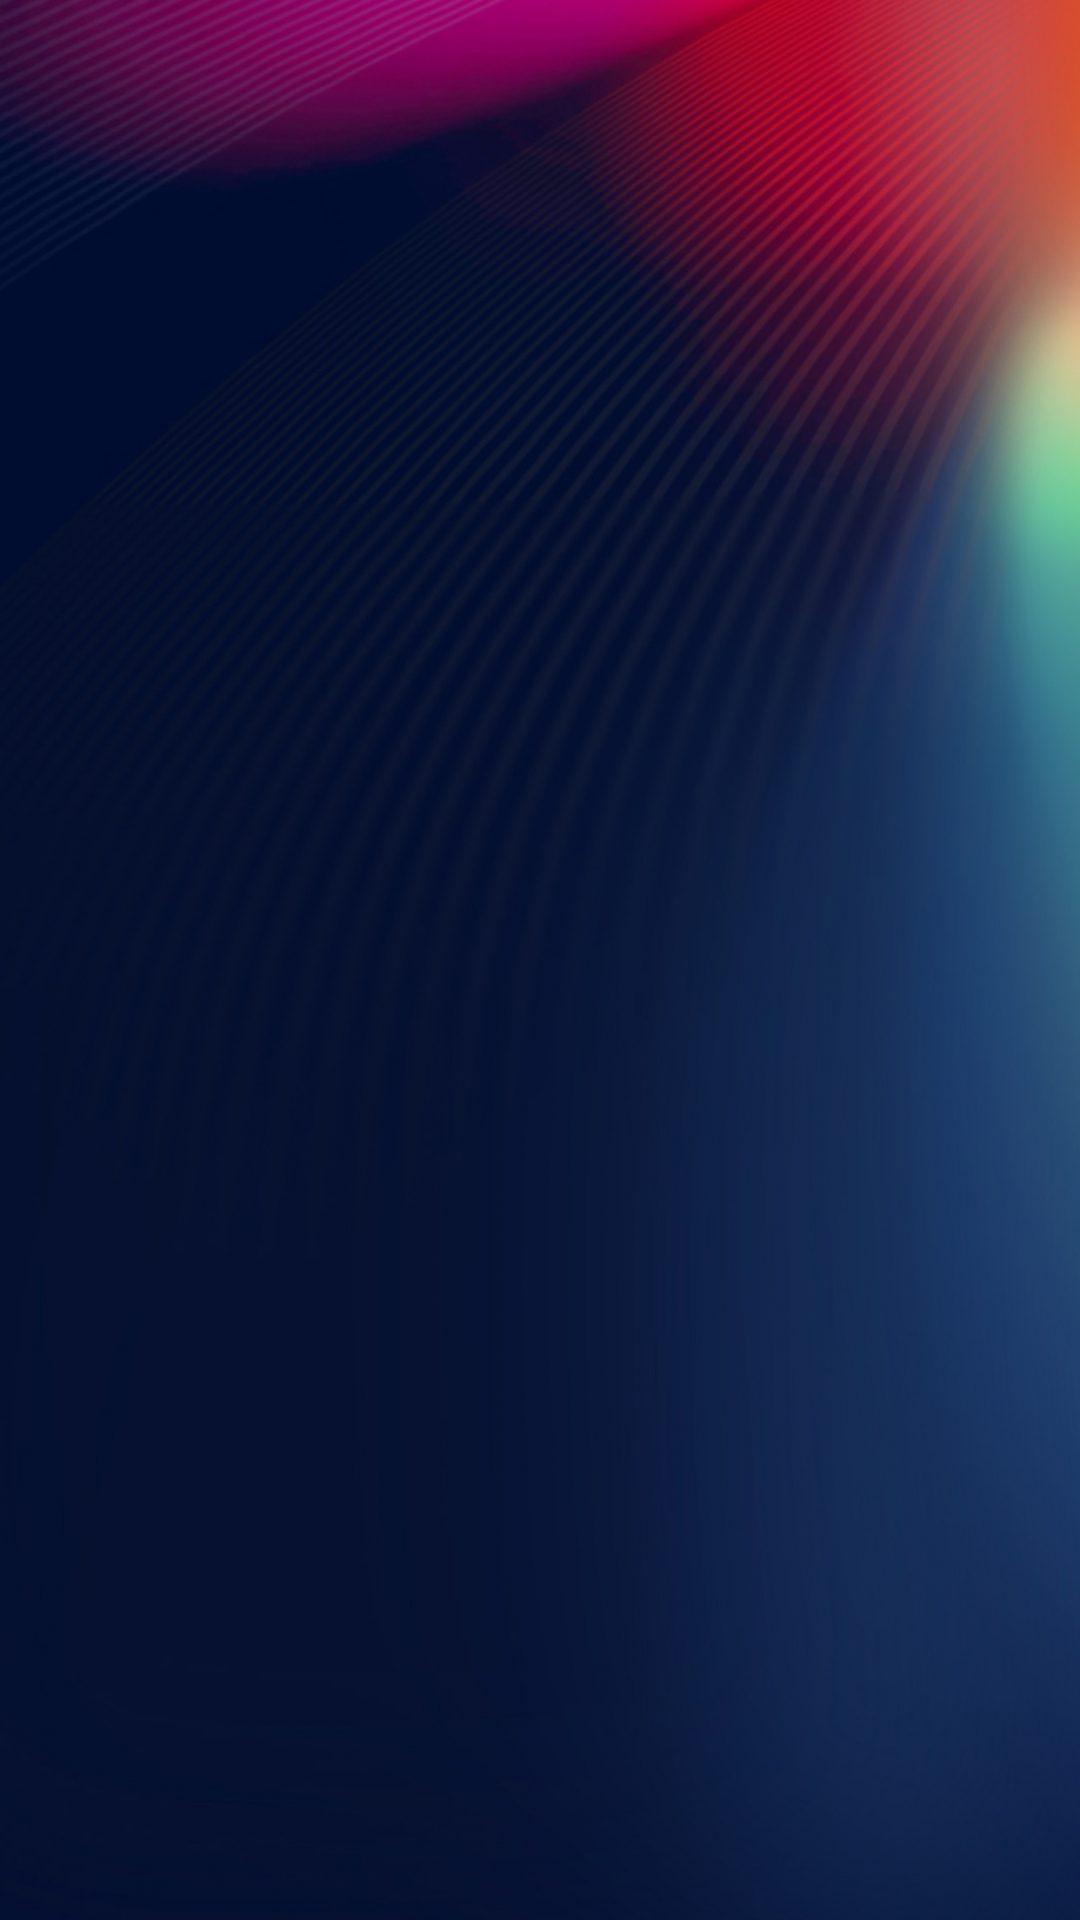 Rainbow Abstract Ligh Blue Pattern